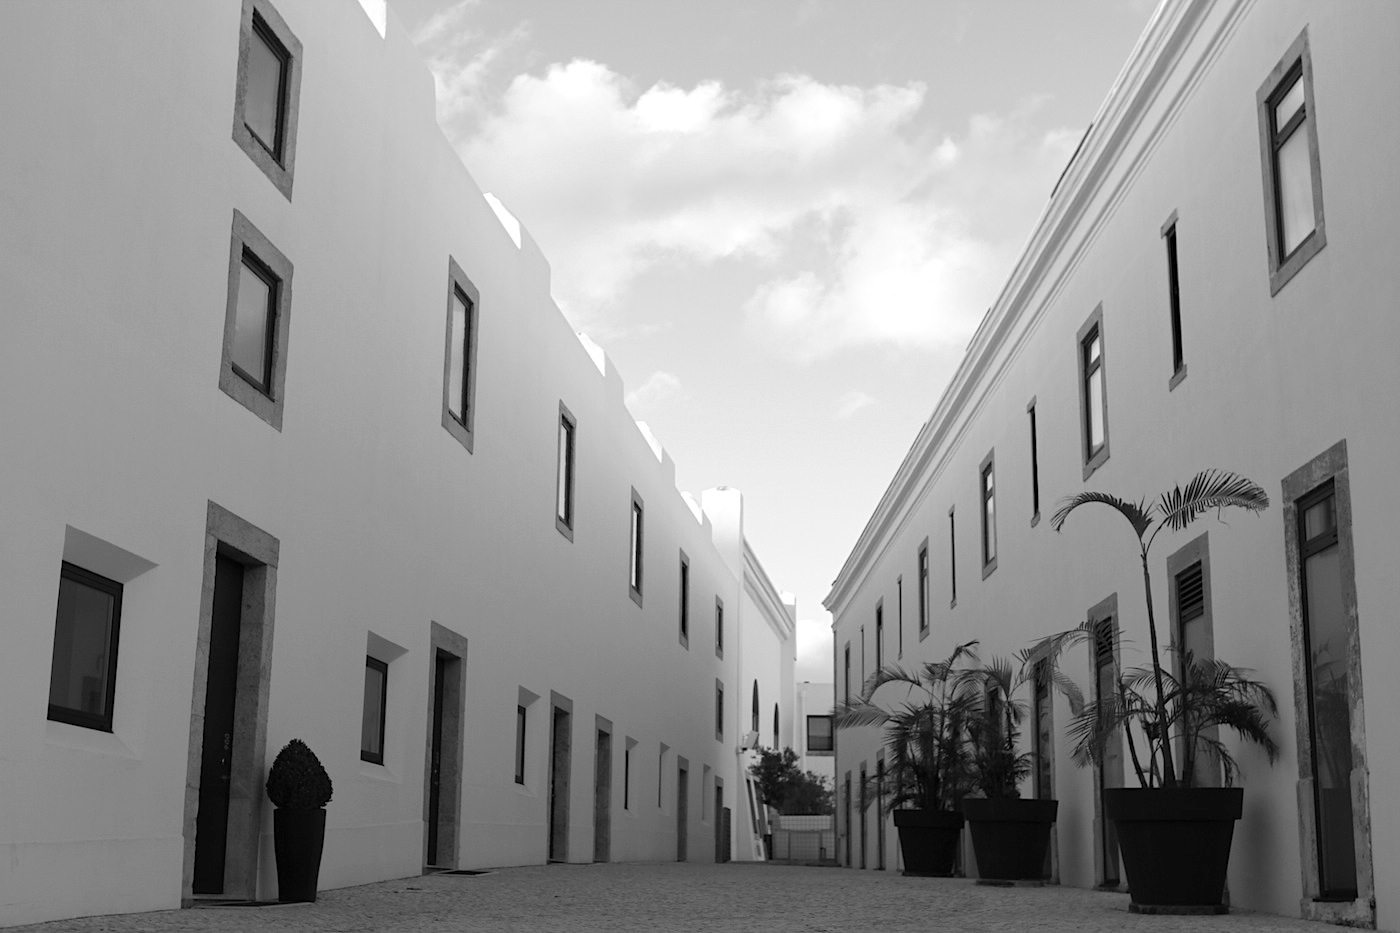 Cidadela de Cascais. Umgestaltung und Planung; Goncalo Byrne, David Sinclair und Joao Gois.